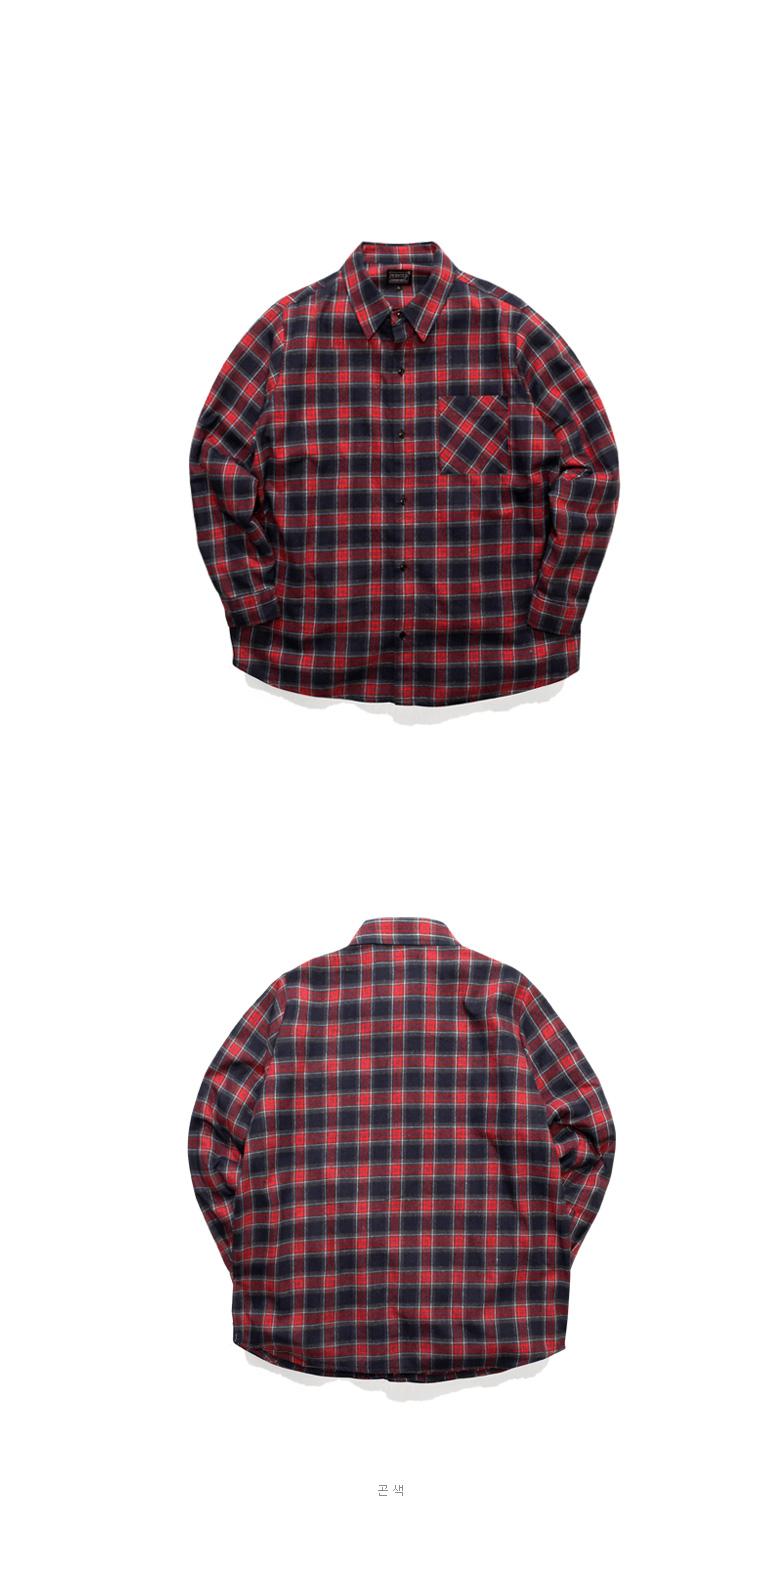 20170829_ps_grand_shirt_navy_sm_01.jpg